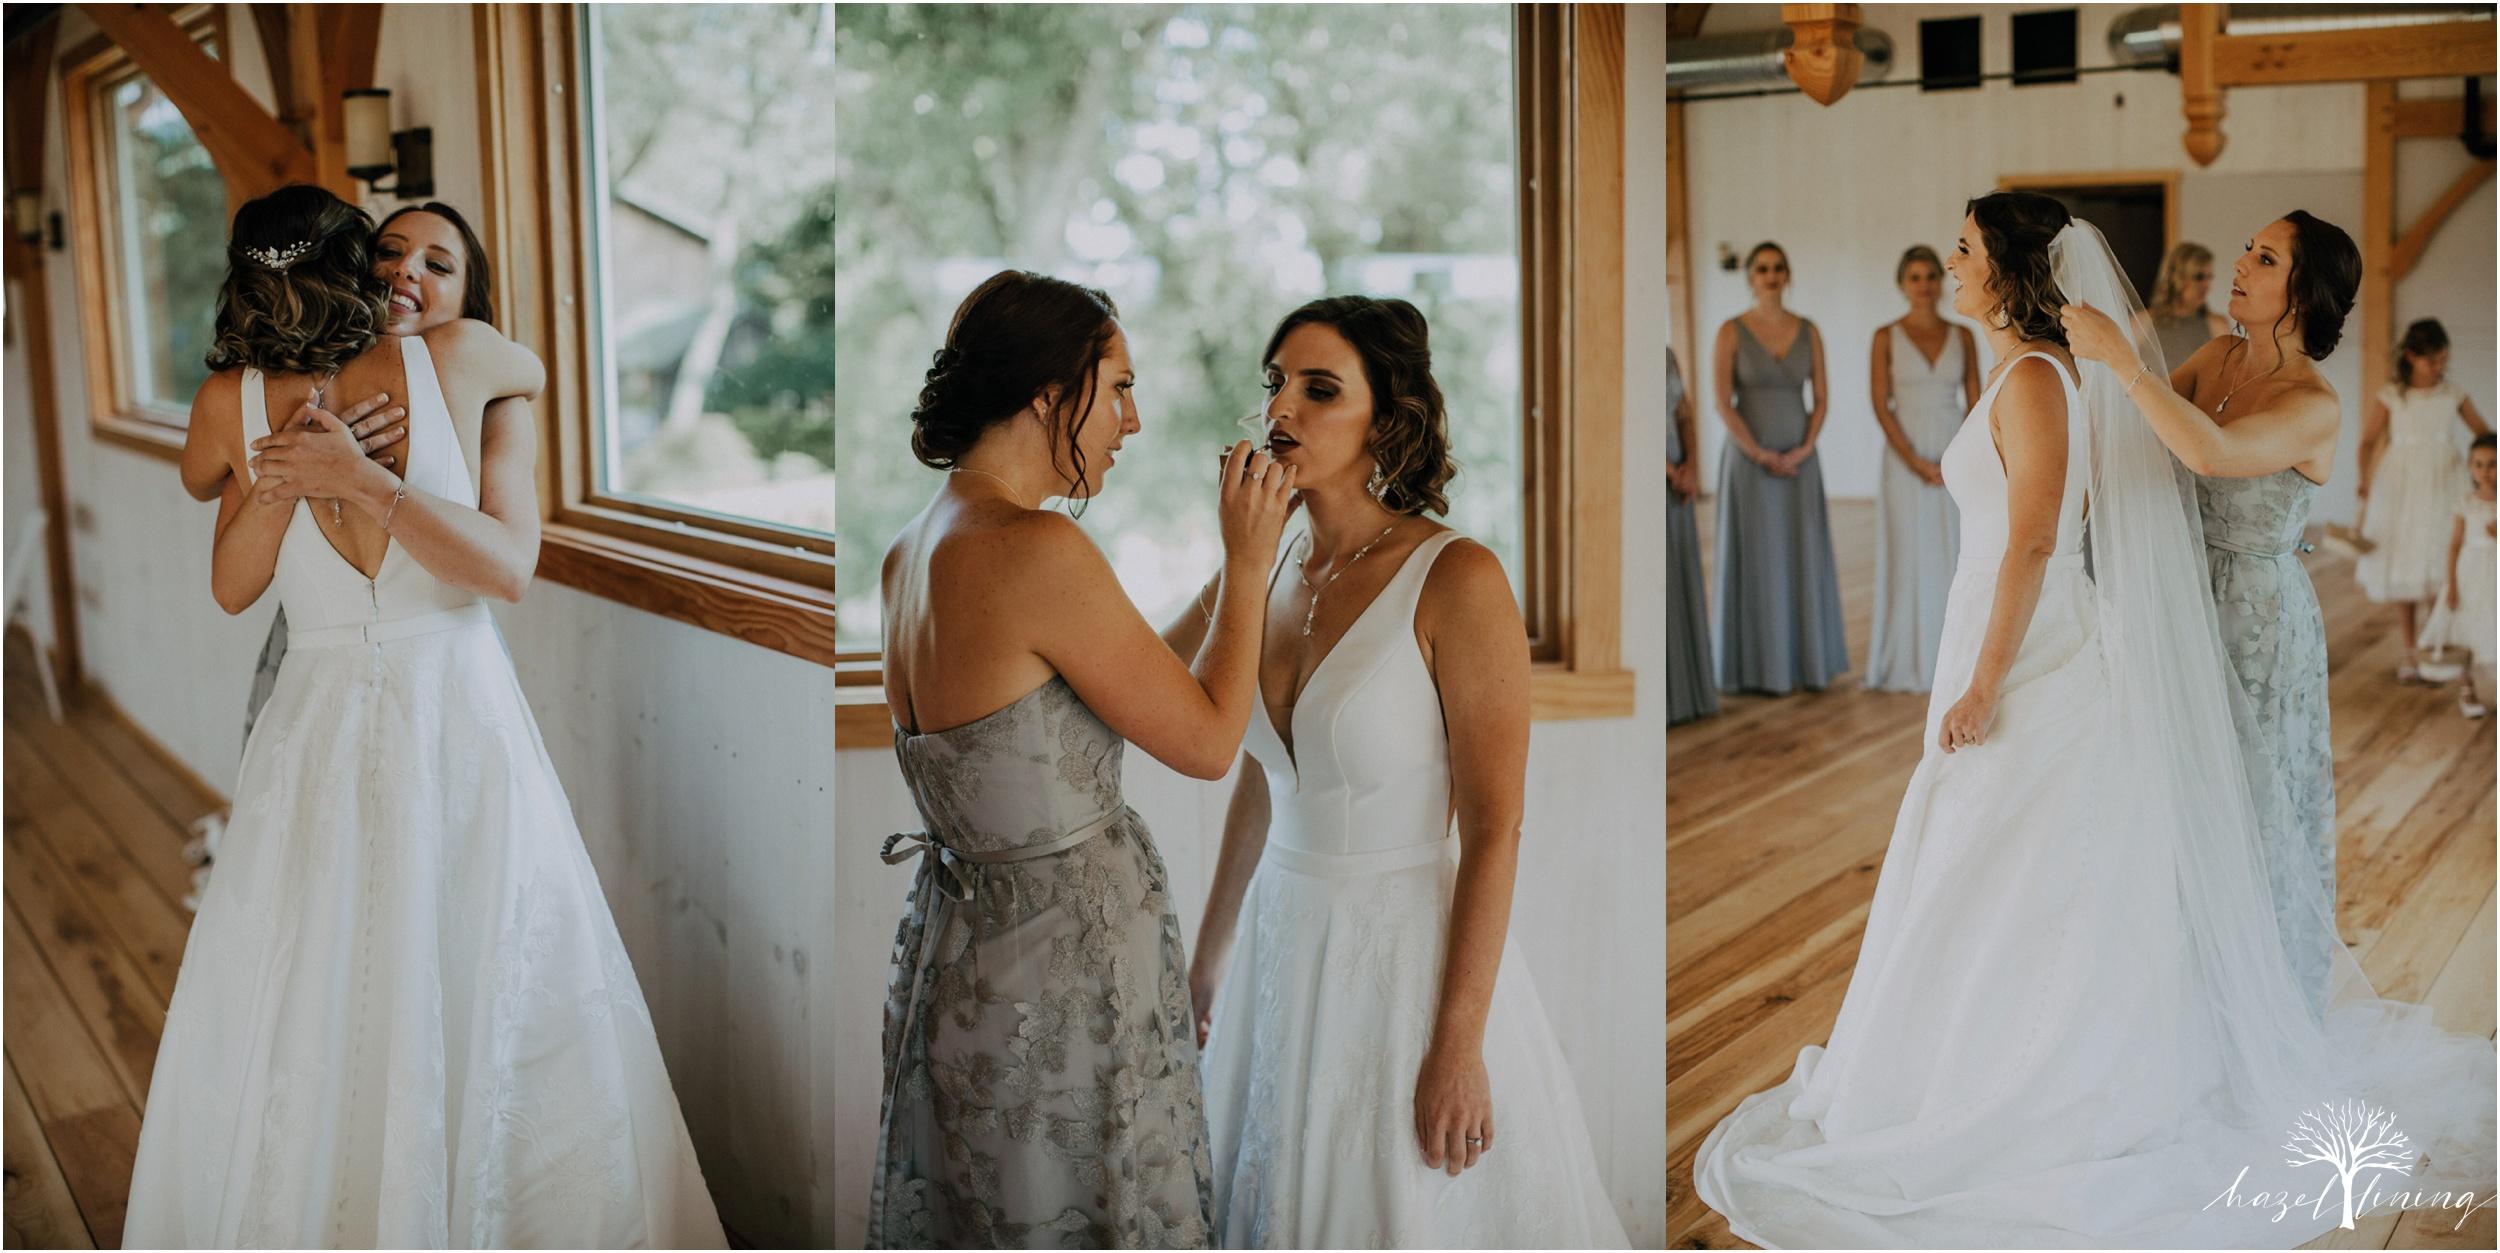 maureen-hepner-anthony-giordano-rose-bank-winery-newtow-pennsylvania-luxury-summer-wedding-hazel-lining-photography-destination-elopement-wedding-engagement-photography_0020.jpg